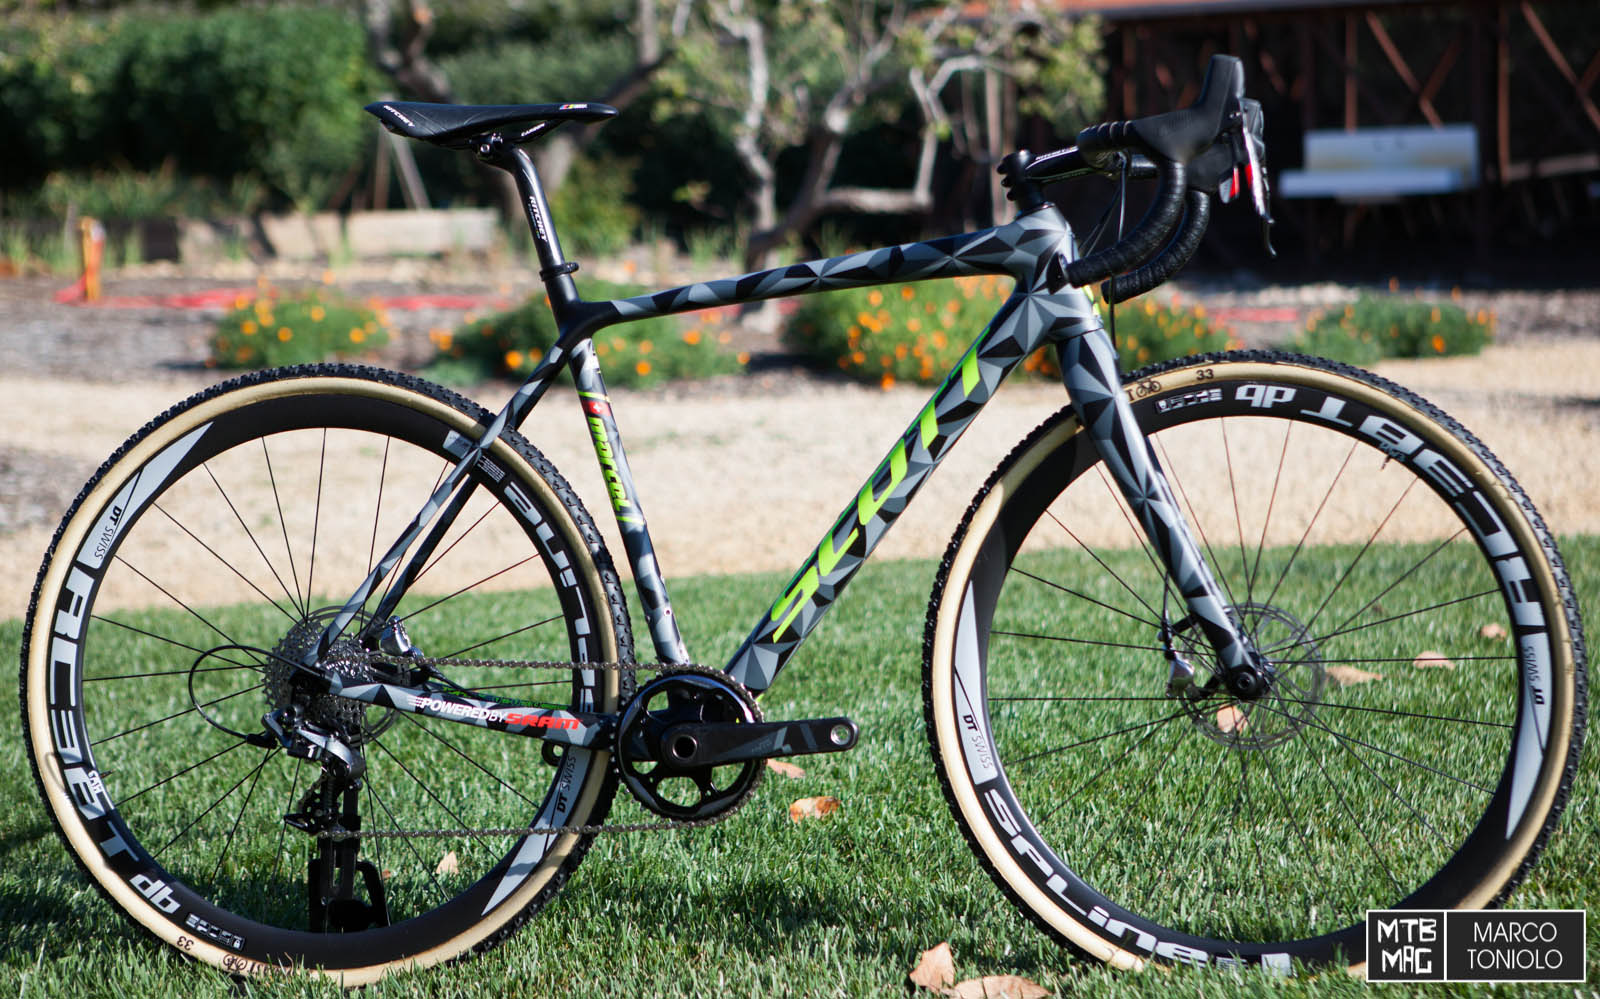 Nuova Scott Addict Cx Bdc Magcom Bici Da Corsa